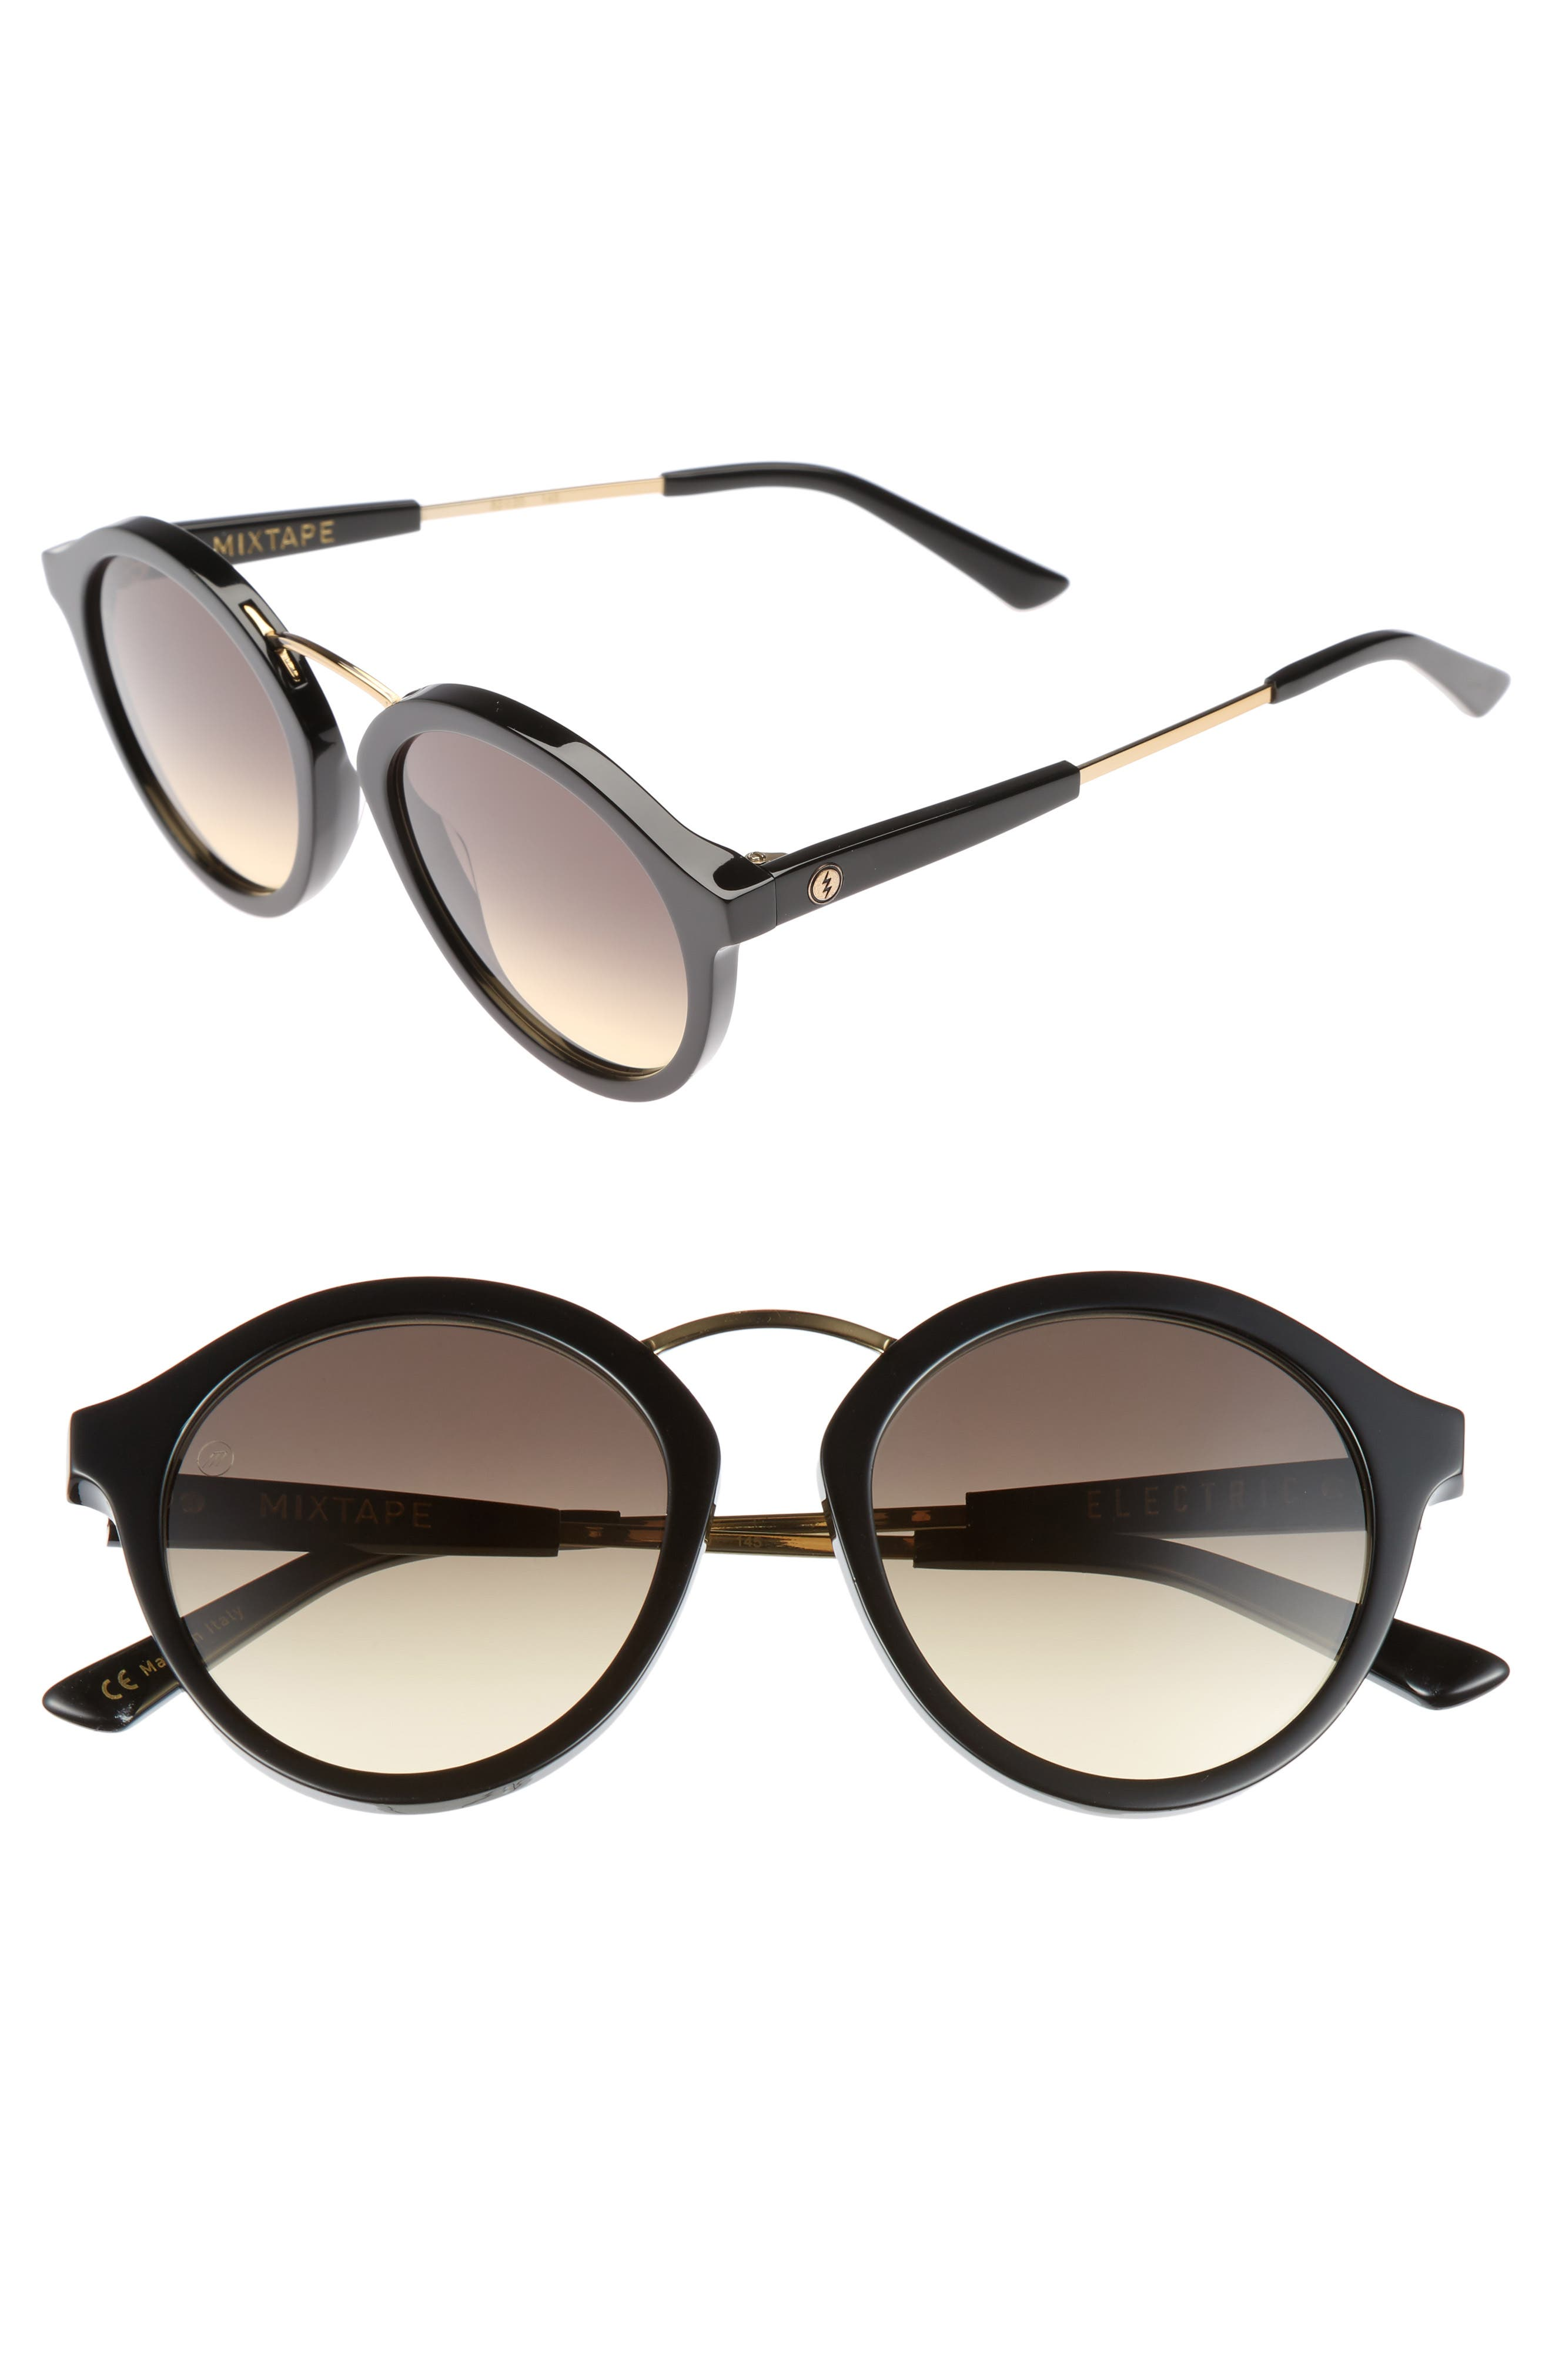 Mix Tape 52mm Gradient Round Sunglasses,                         Main,                         color, Gloss Black/ Black Gradient